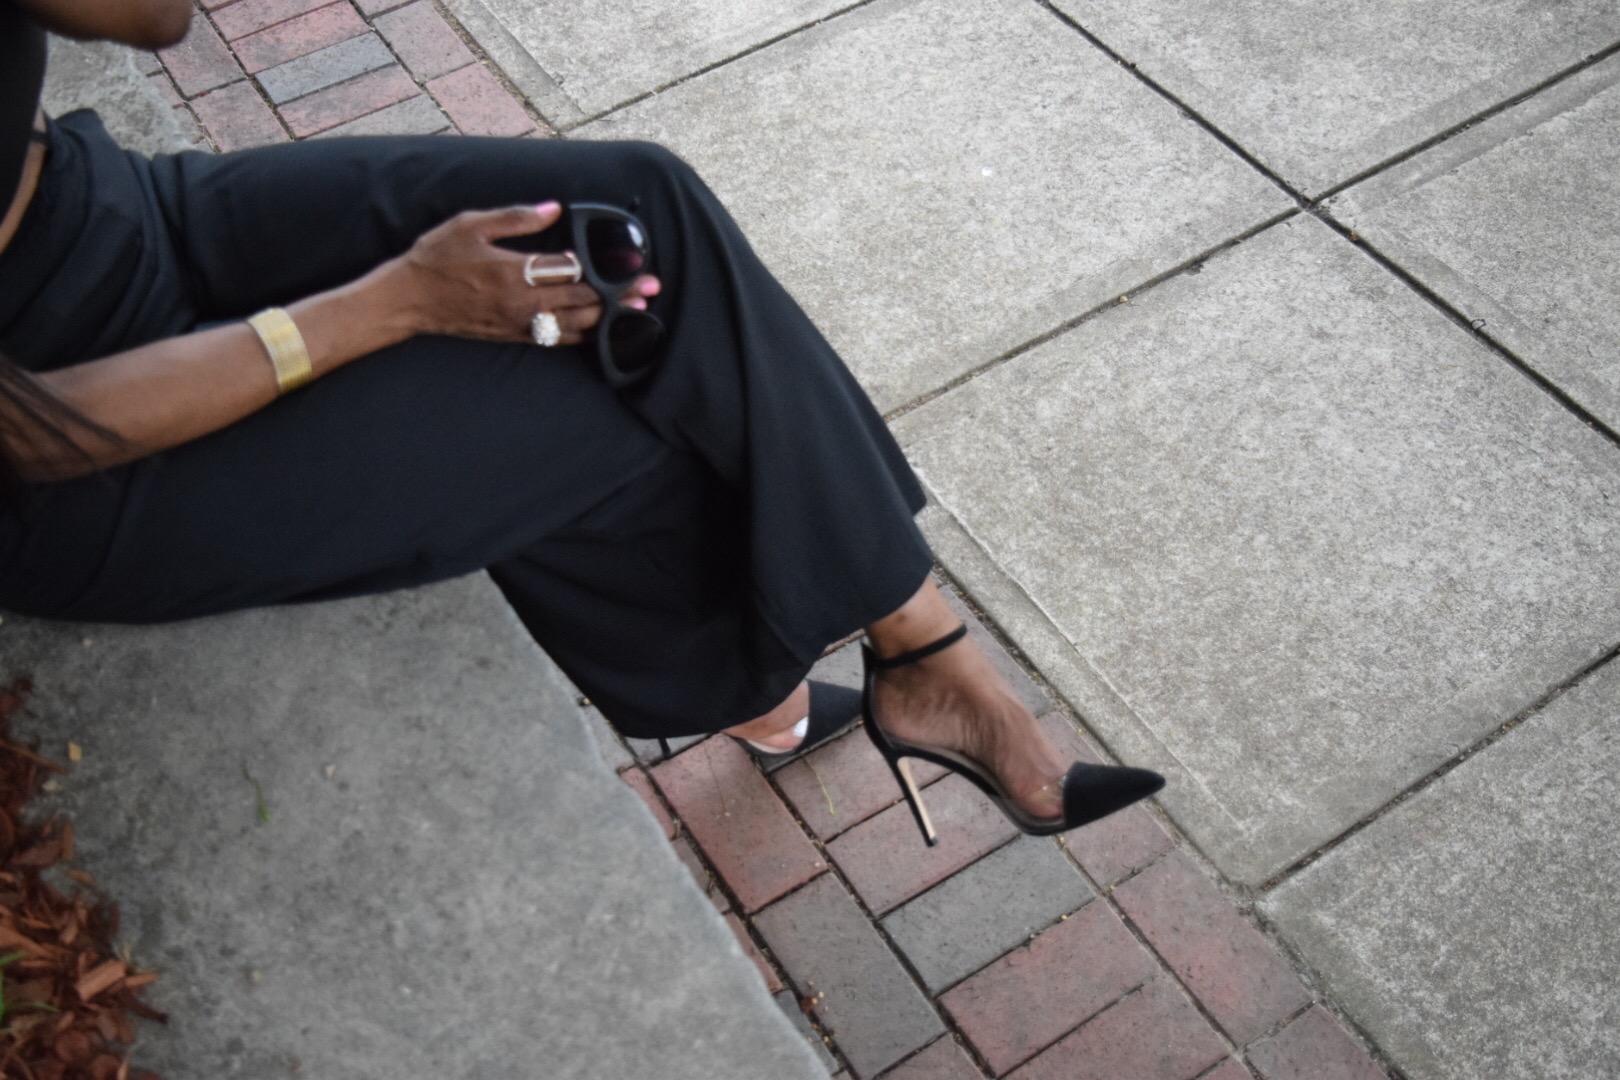 Style-Files-Boohoo-Ira Full Wide Leg Floor Sweeping Trousers-boohoo-Lucy Webbed Lace Choker Body Harness-Forever21-leather-bandeau-mac-cosmetics-faux-lipstick-justfab-catherina-black-heels-Vinyl- DOrsay High Heel-Pumps-Zara-oohlalablog-3